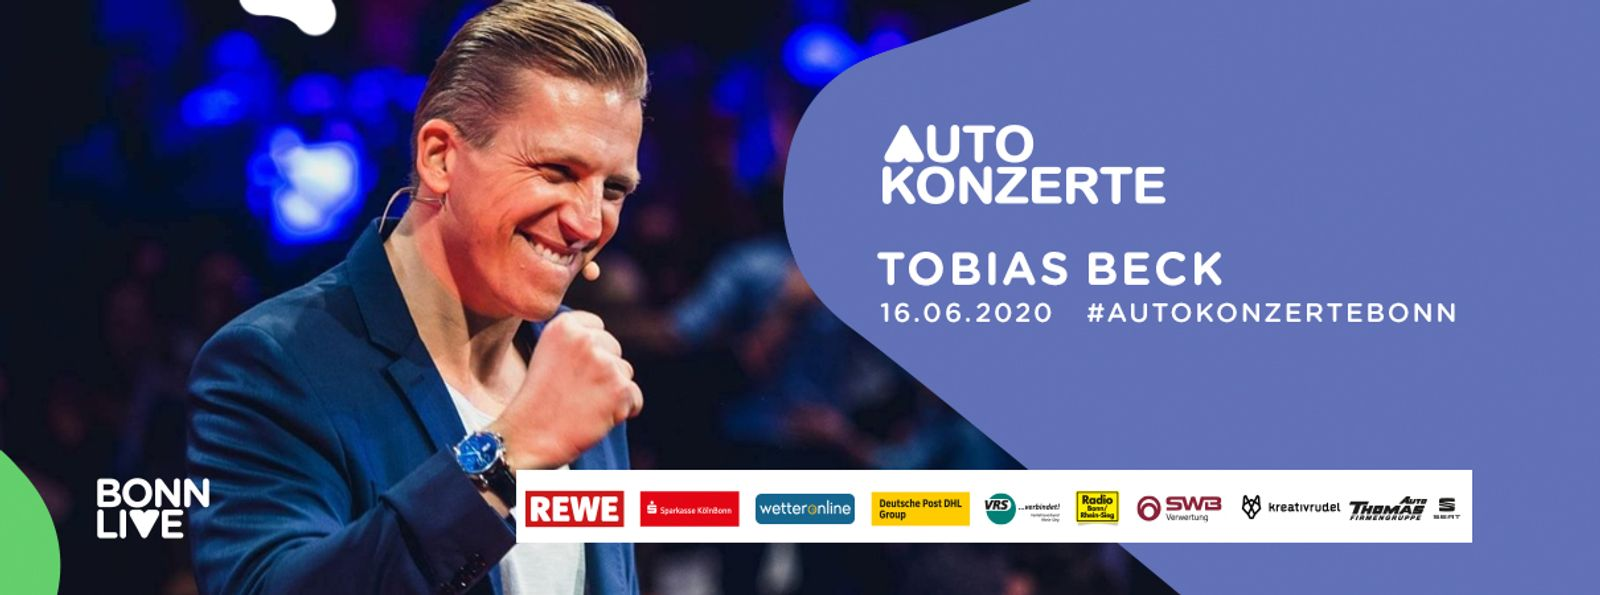 Tobias Beck | BonnLive Autokonzerte